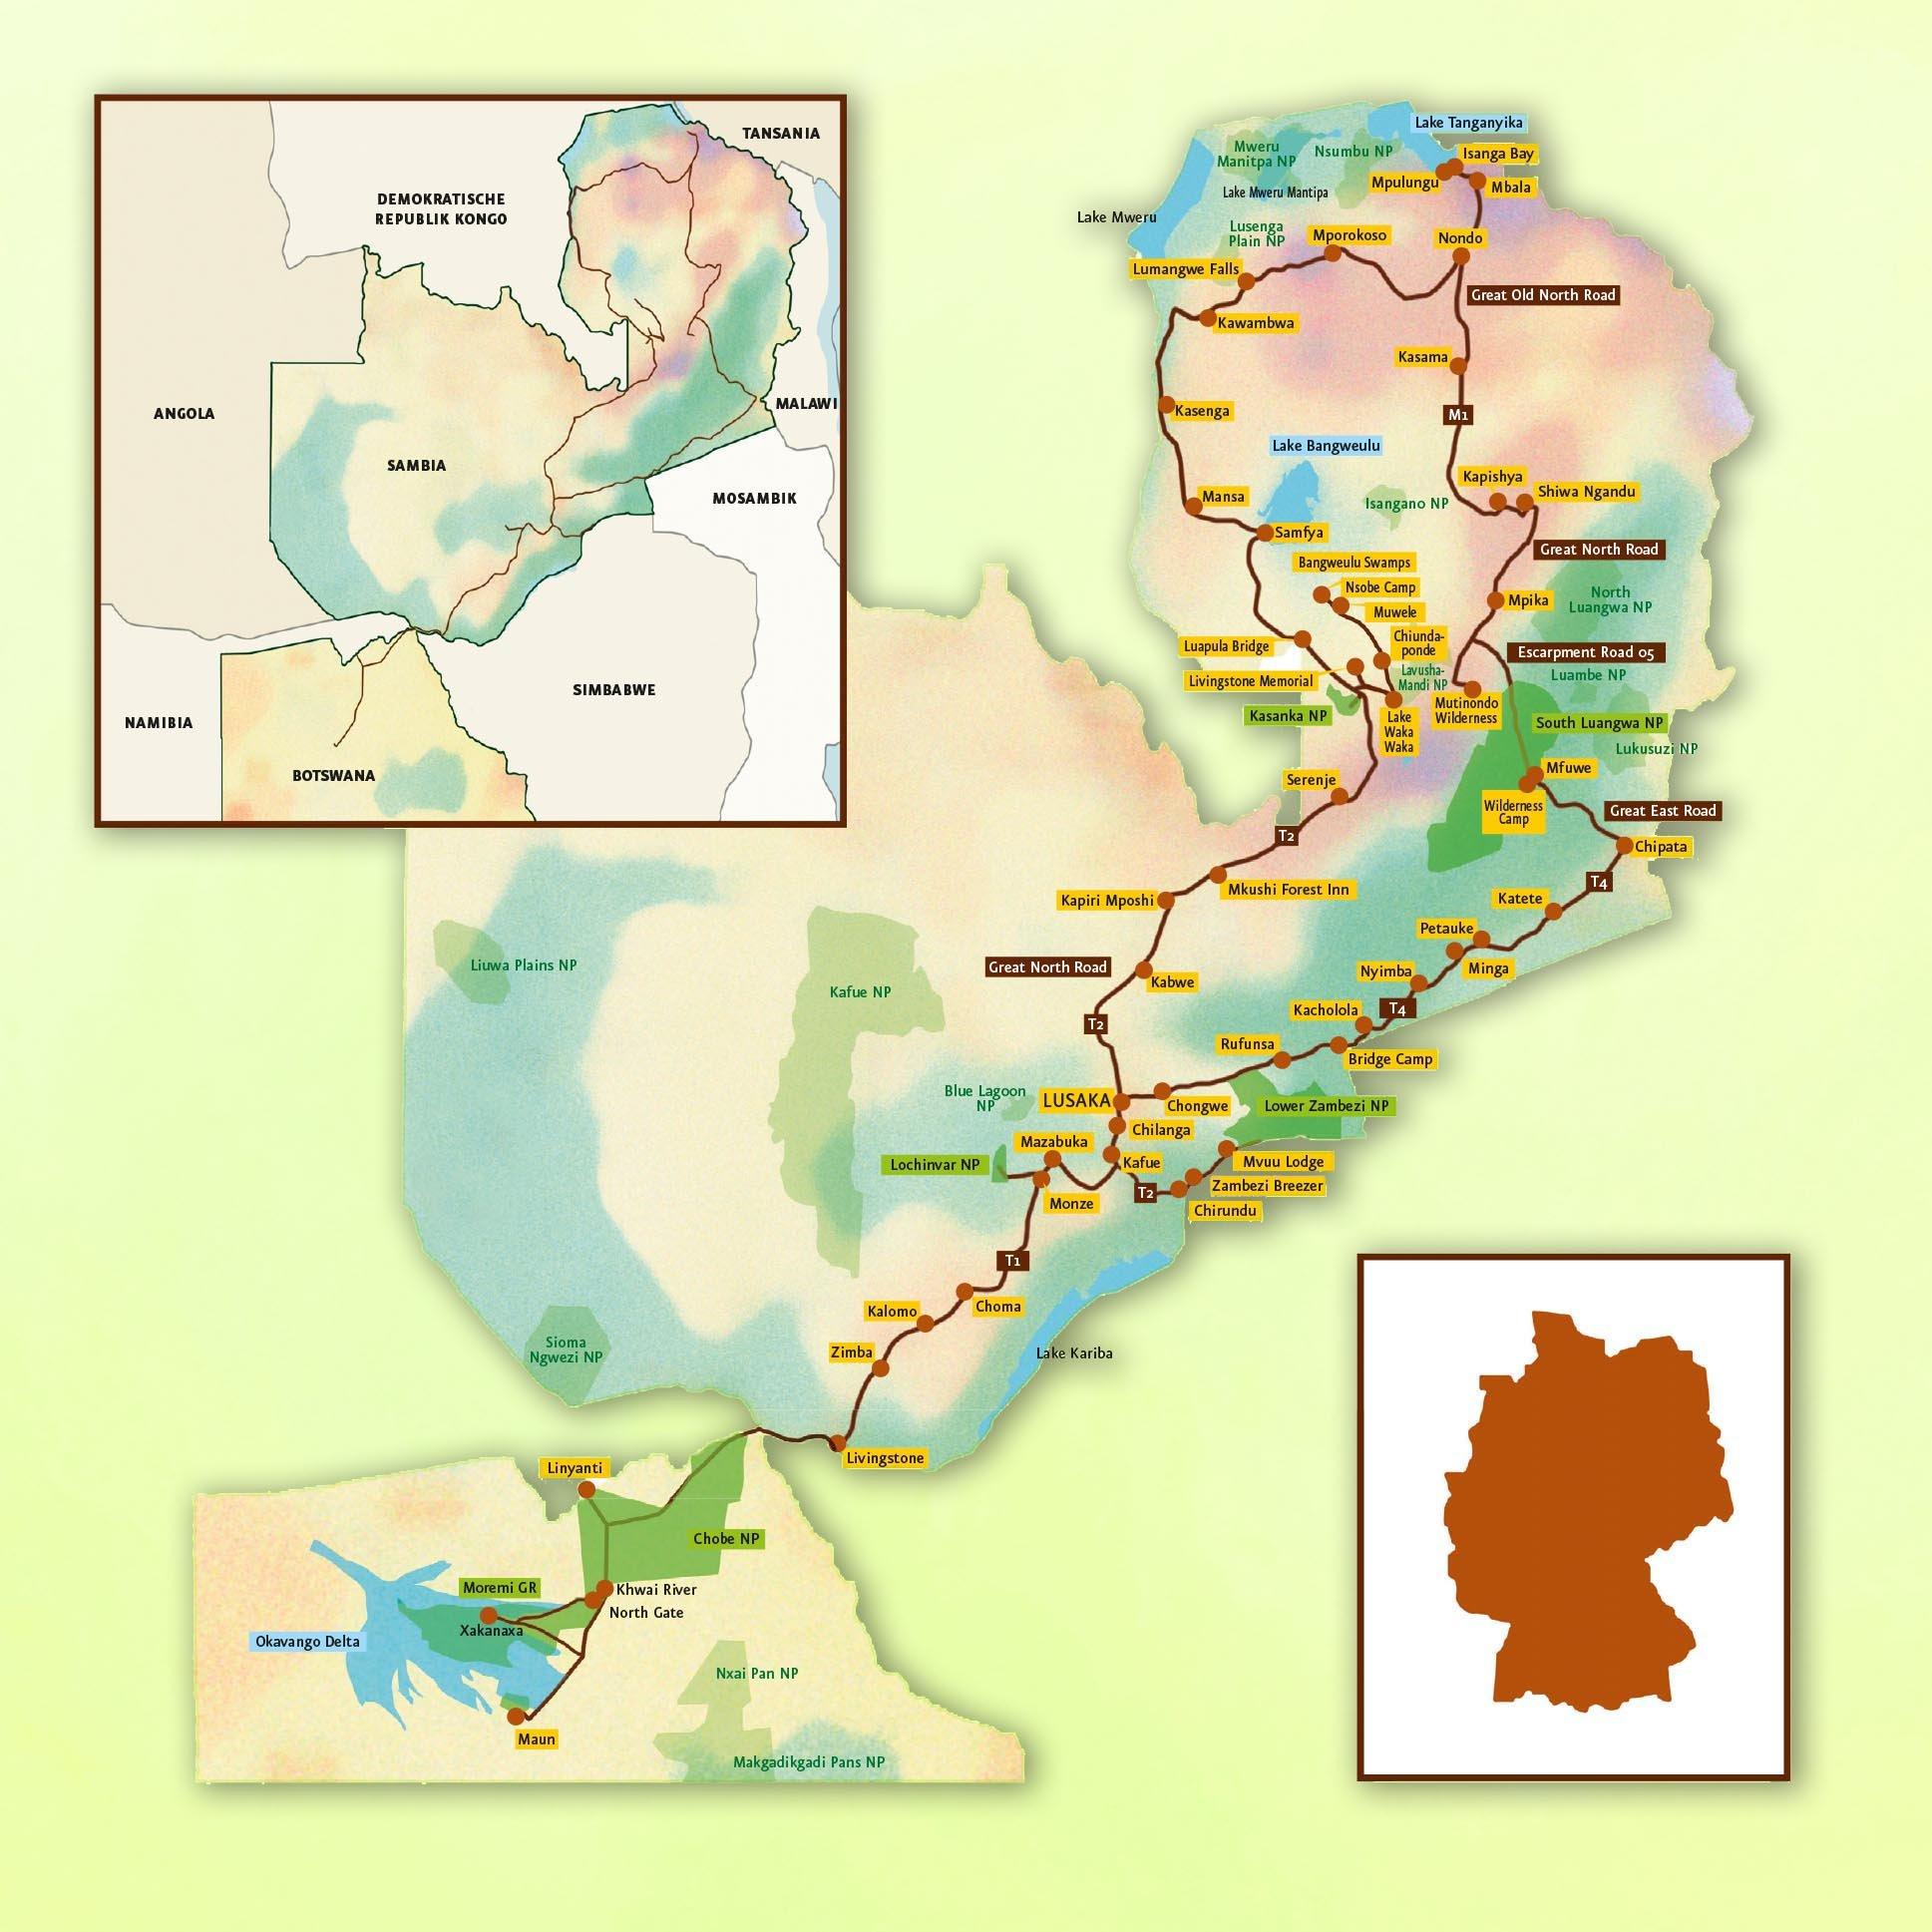 Reisebericht Reiseroute Botswana-Sambia 2008